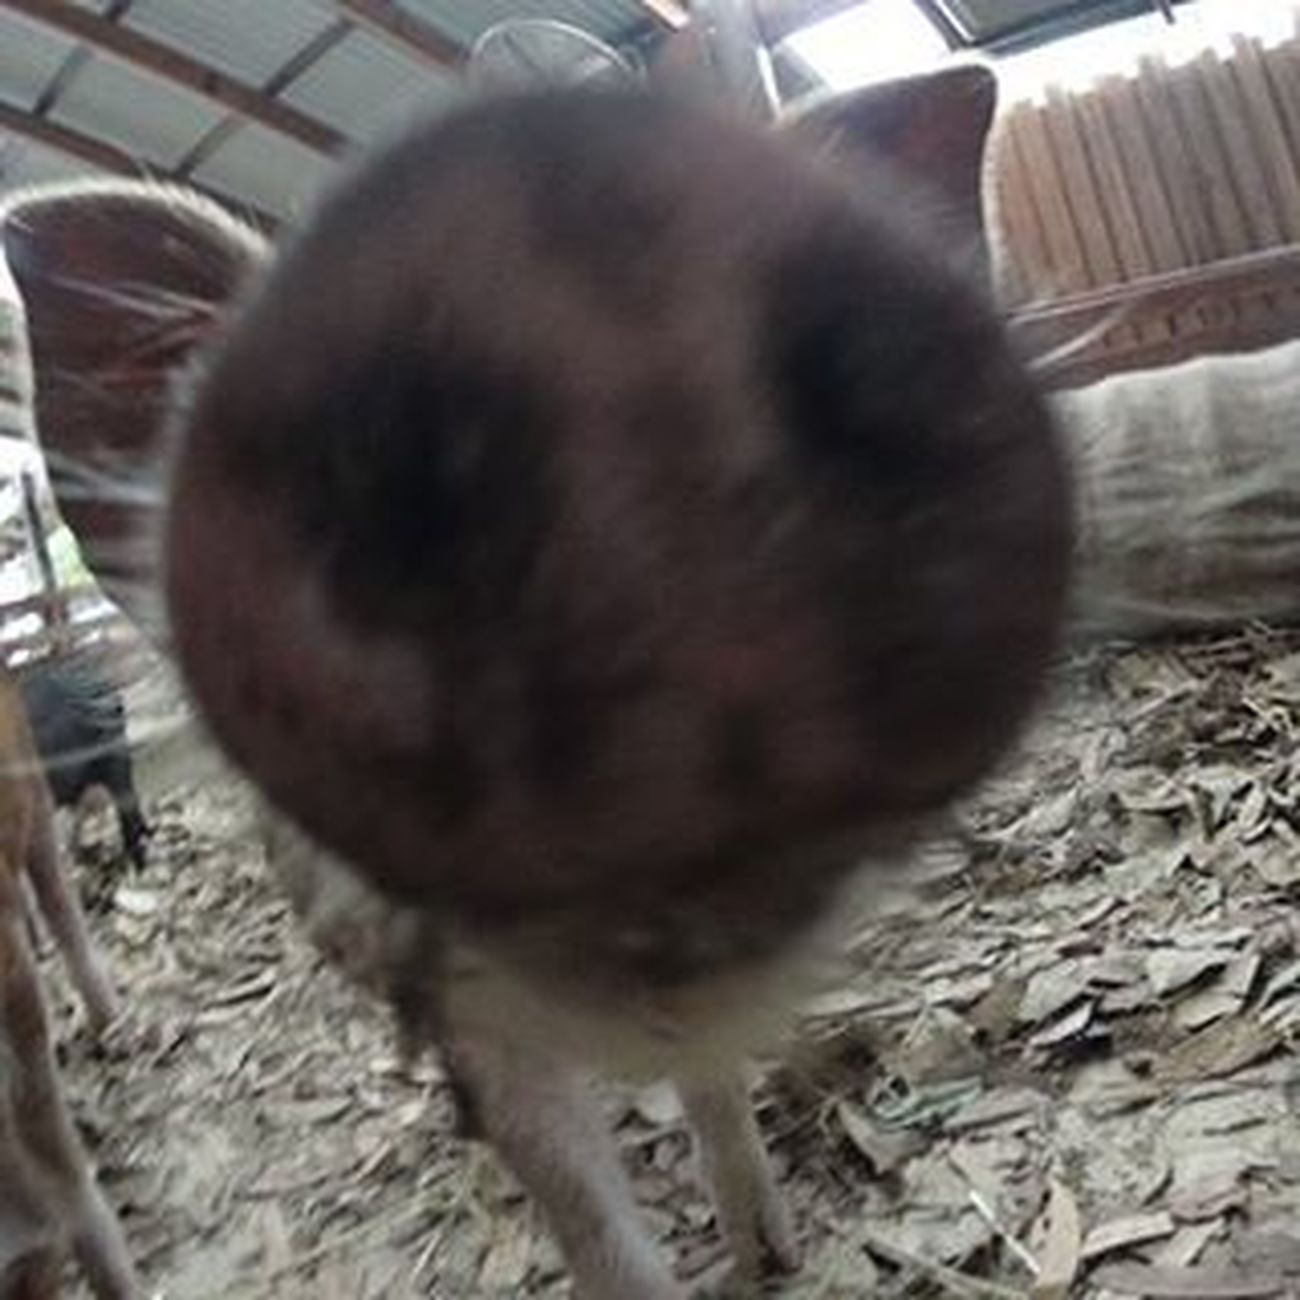 """Your camera smells good, can I taste it?"" Piglet at Australia Zoo Exploreoz Exploreaustralia Pig Piggy Oink Australiazoo Actioncam Closeup Nom Nomakeup Nose Takemeback Cute"